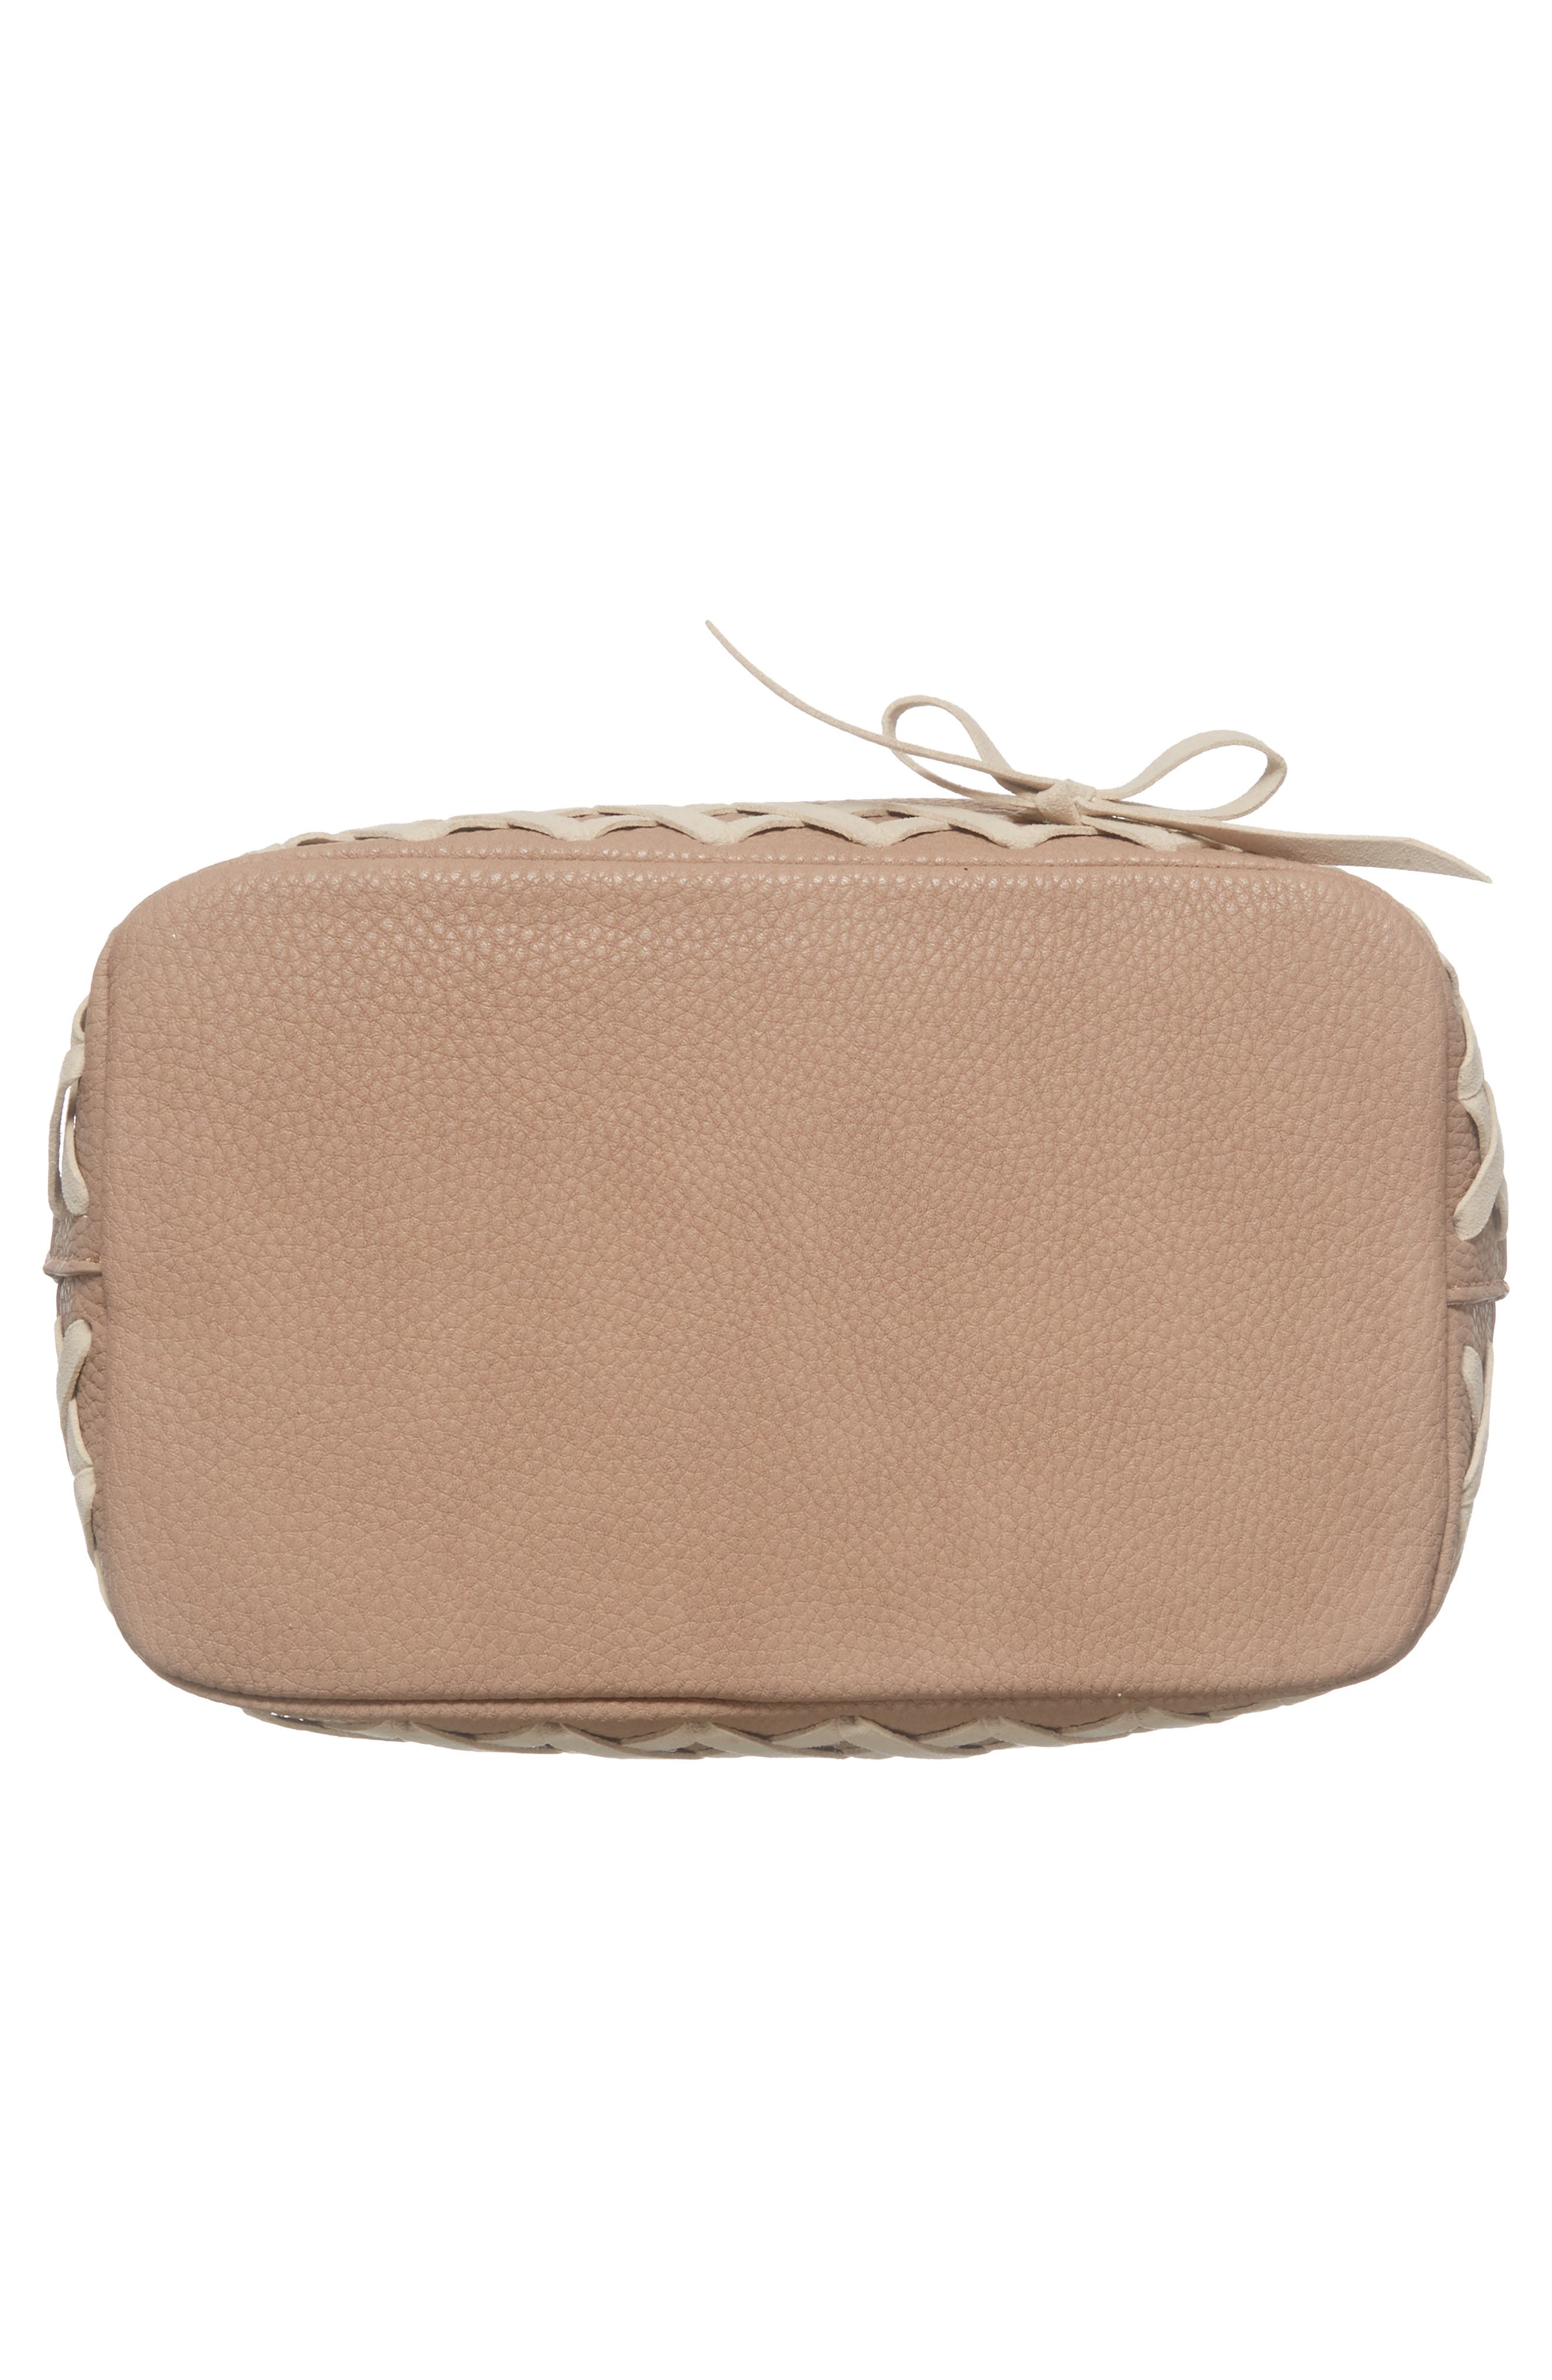 Veronica Faux Leather Bucket Bag,                             Alternate thumbnail 6, color,                             250